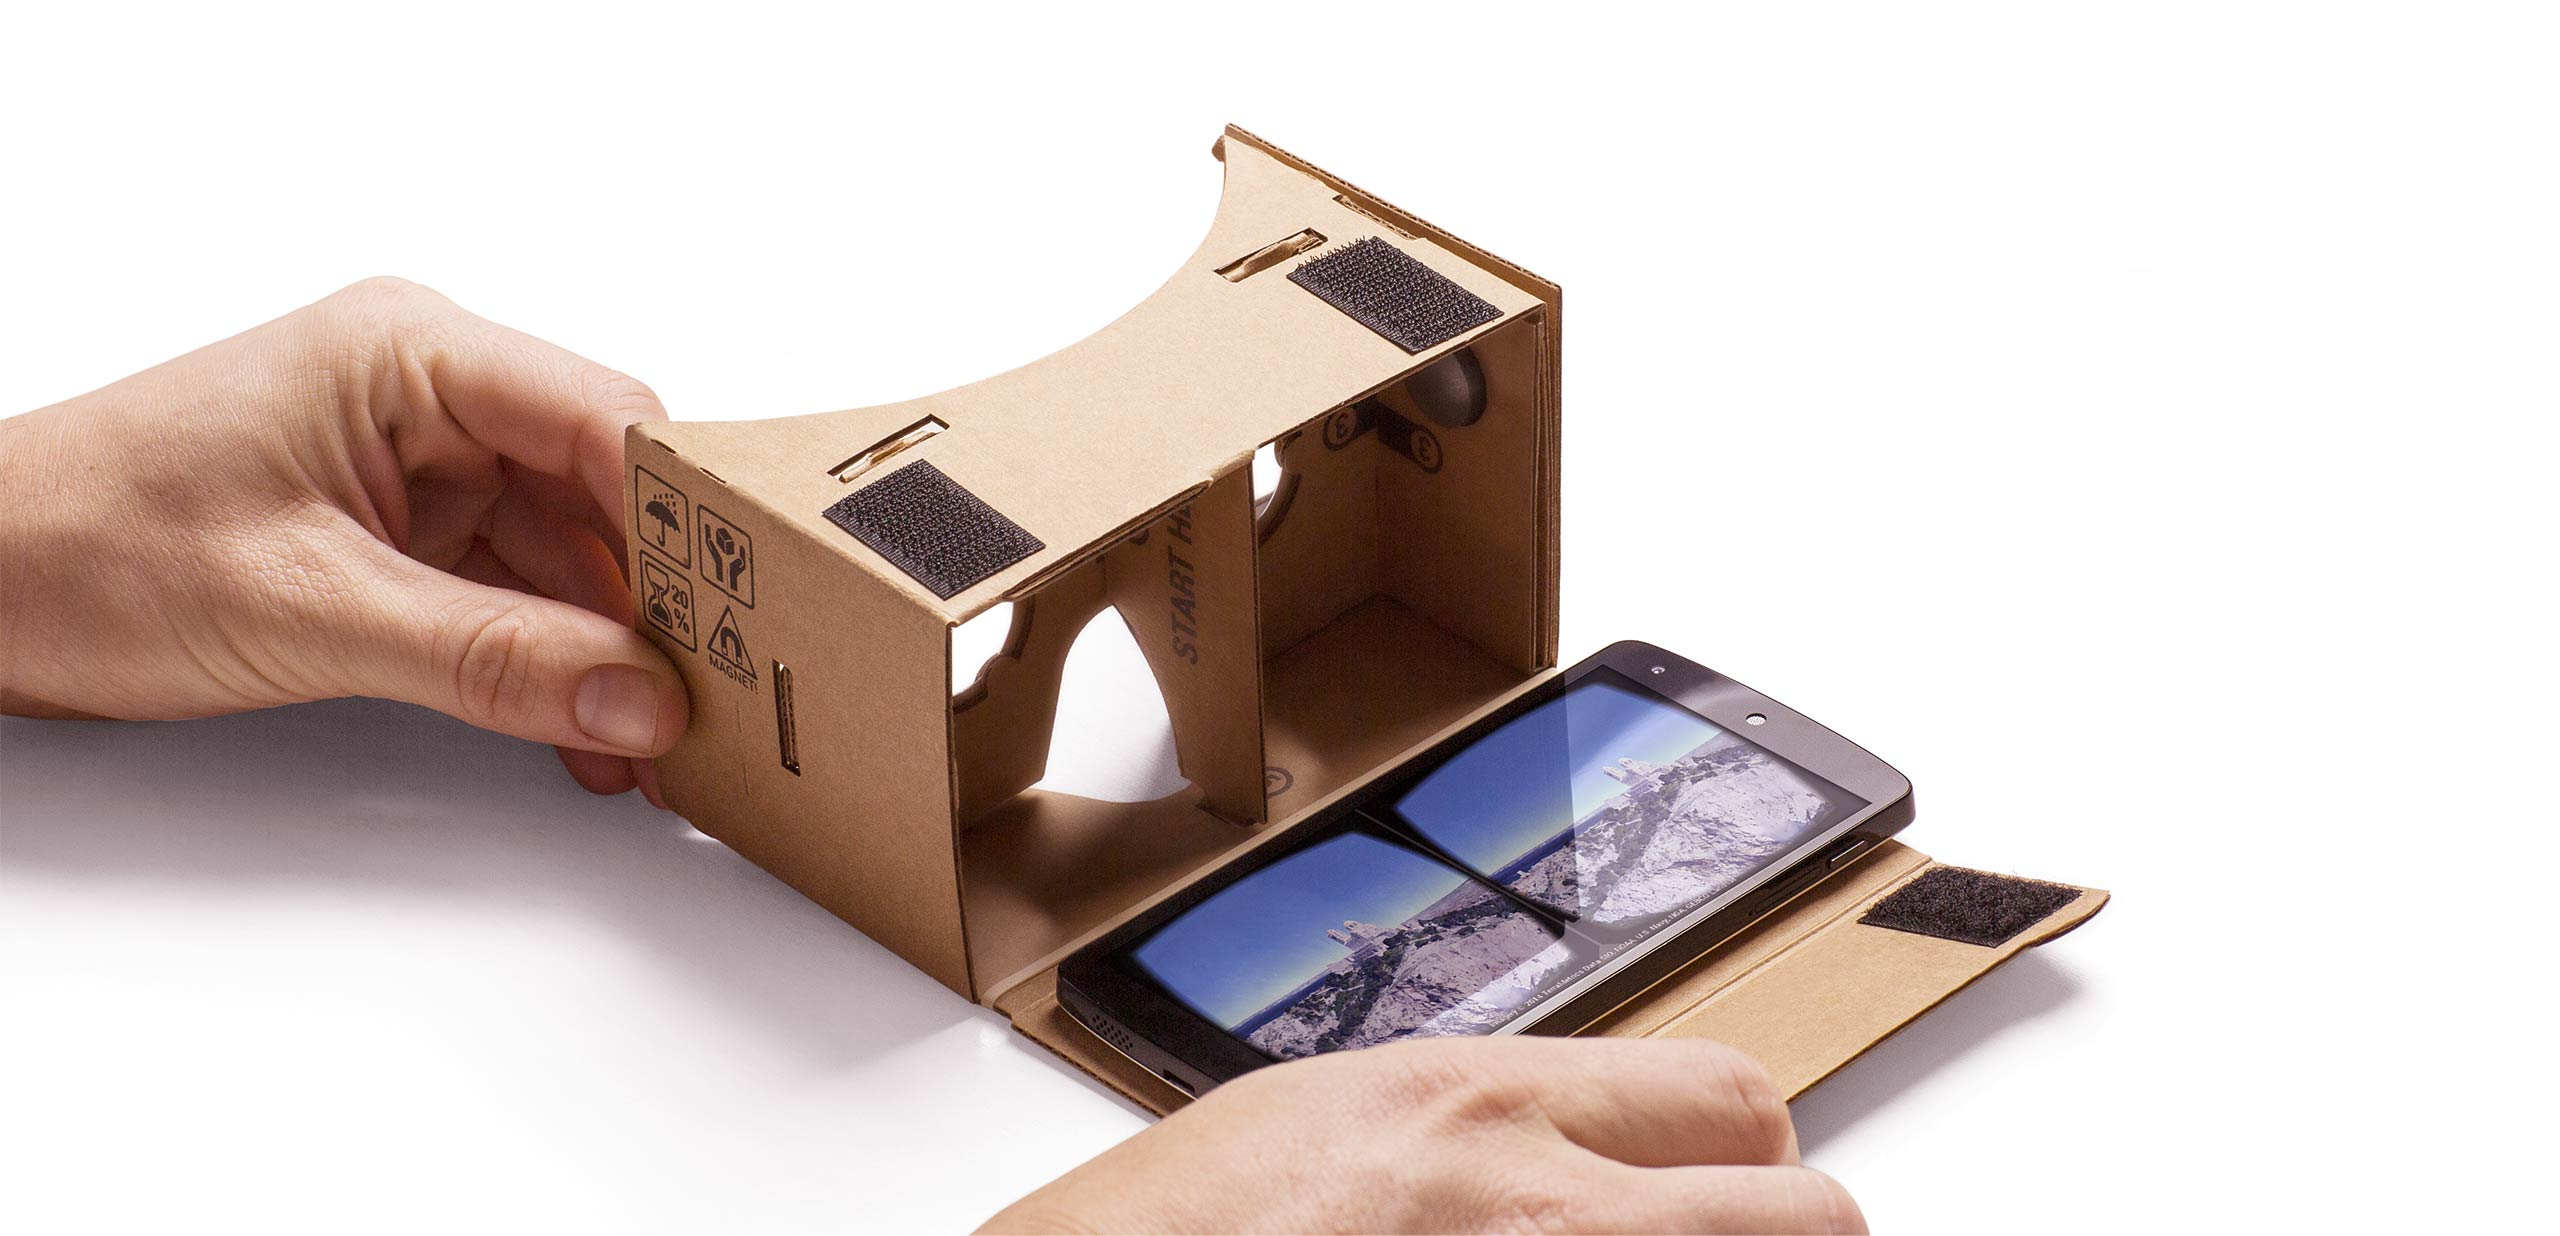 80b8d4da3bc0 DIY  How To Make Your Own Oculus Rift Virtual Reality Headset - InfiniGEEK